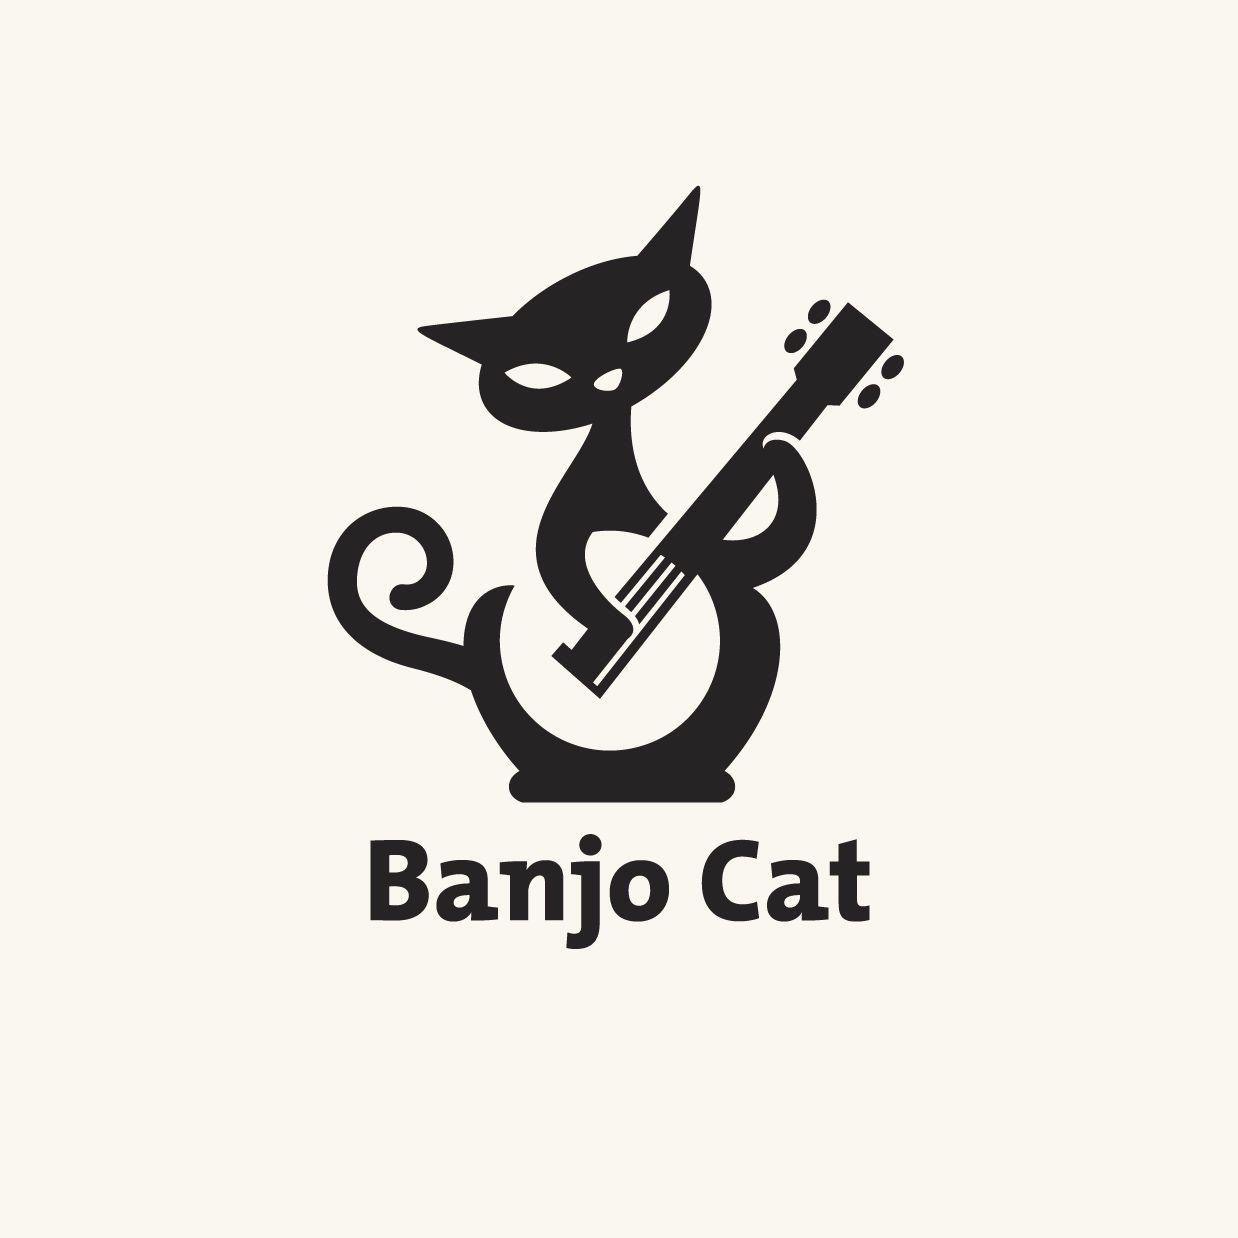 Bathroom logos ideas - Cats In Design It S Awesome Banjo Cat Logo By Randyheil